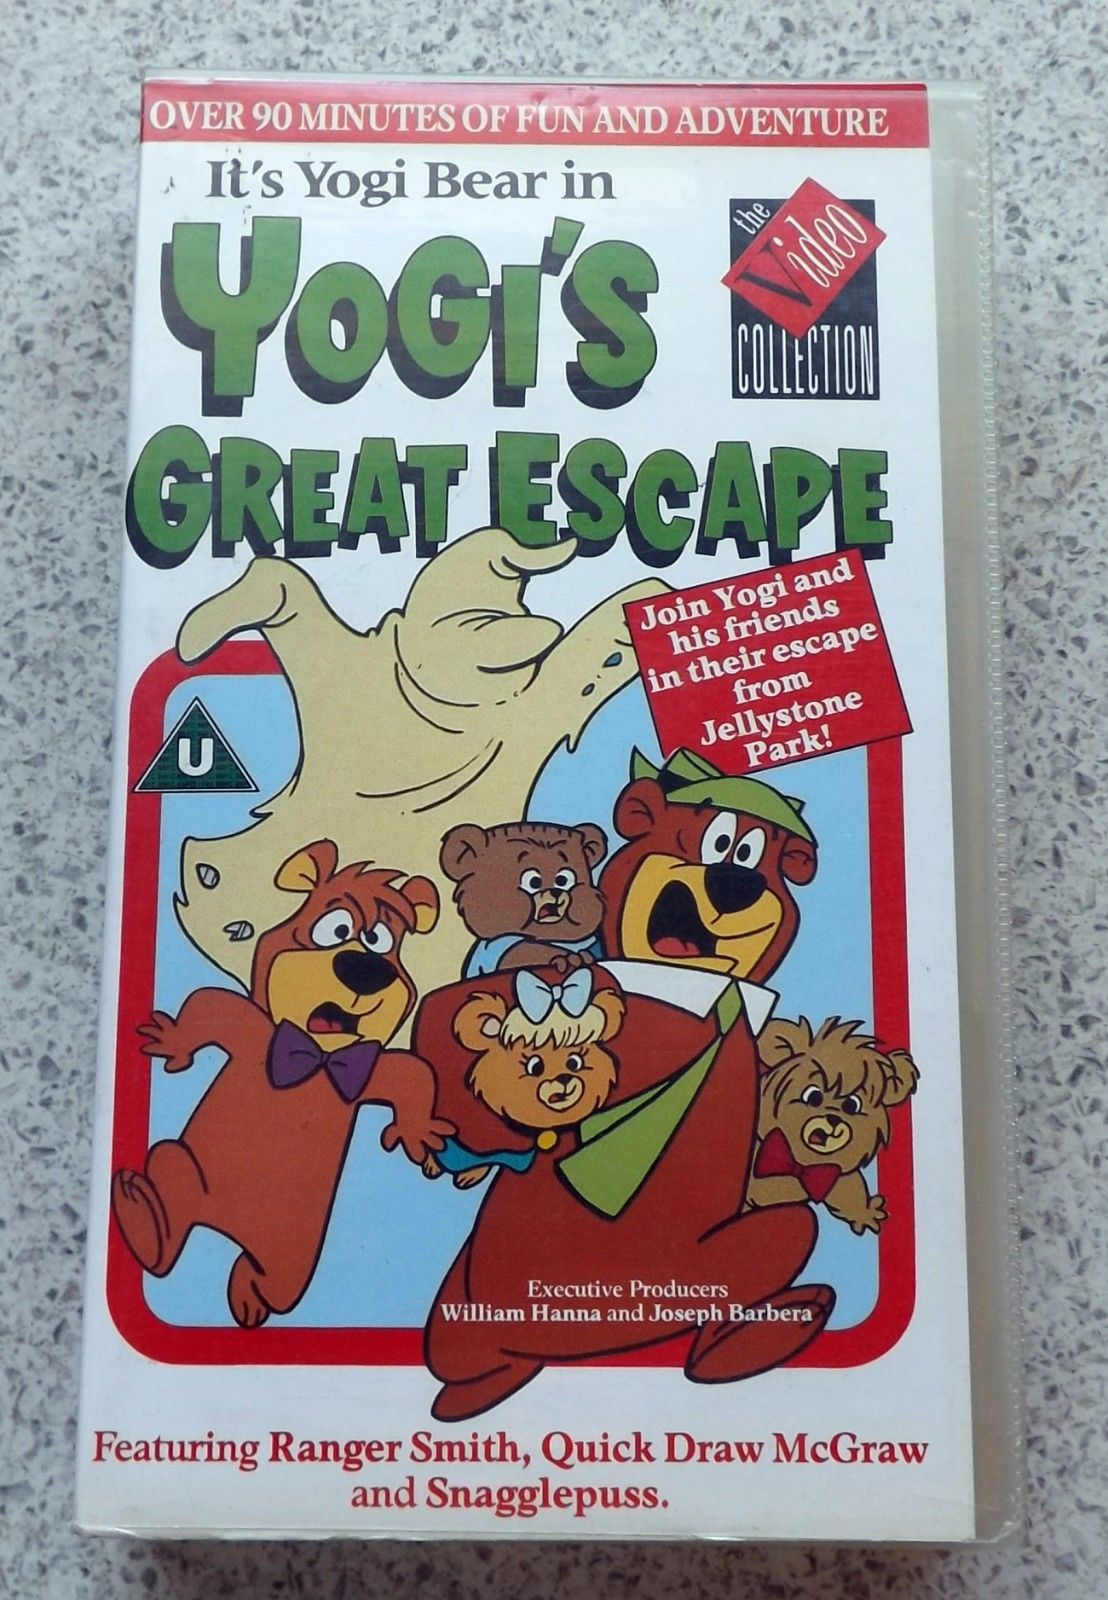 Yogi's Great Escape | Video Collection International Wikia | FANDOM